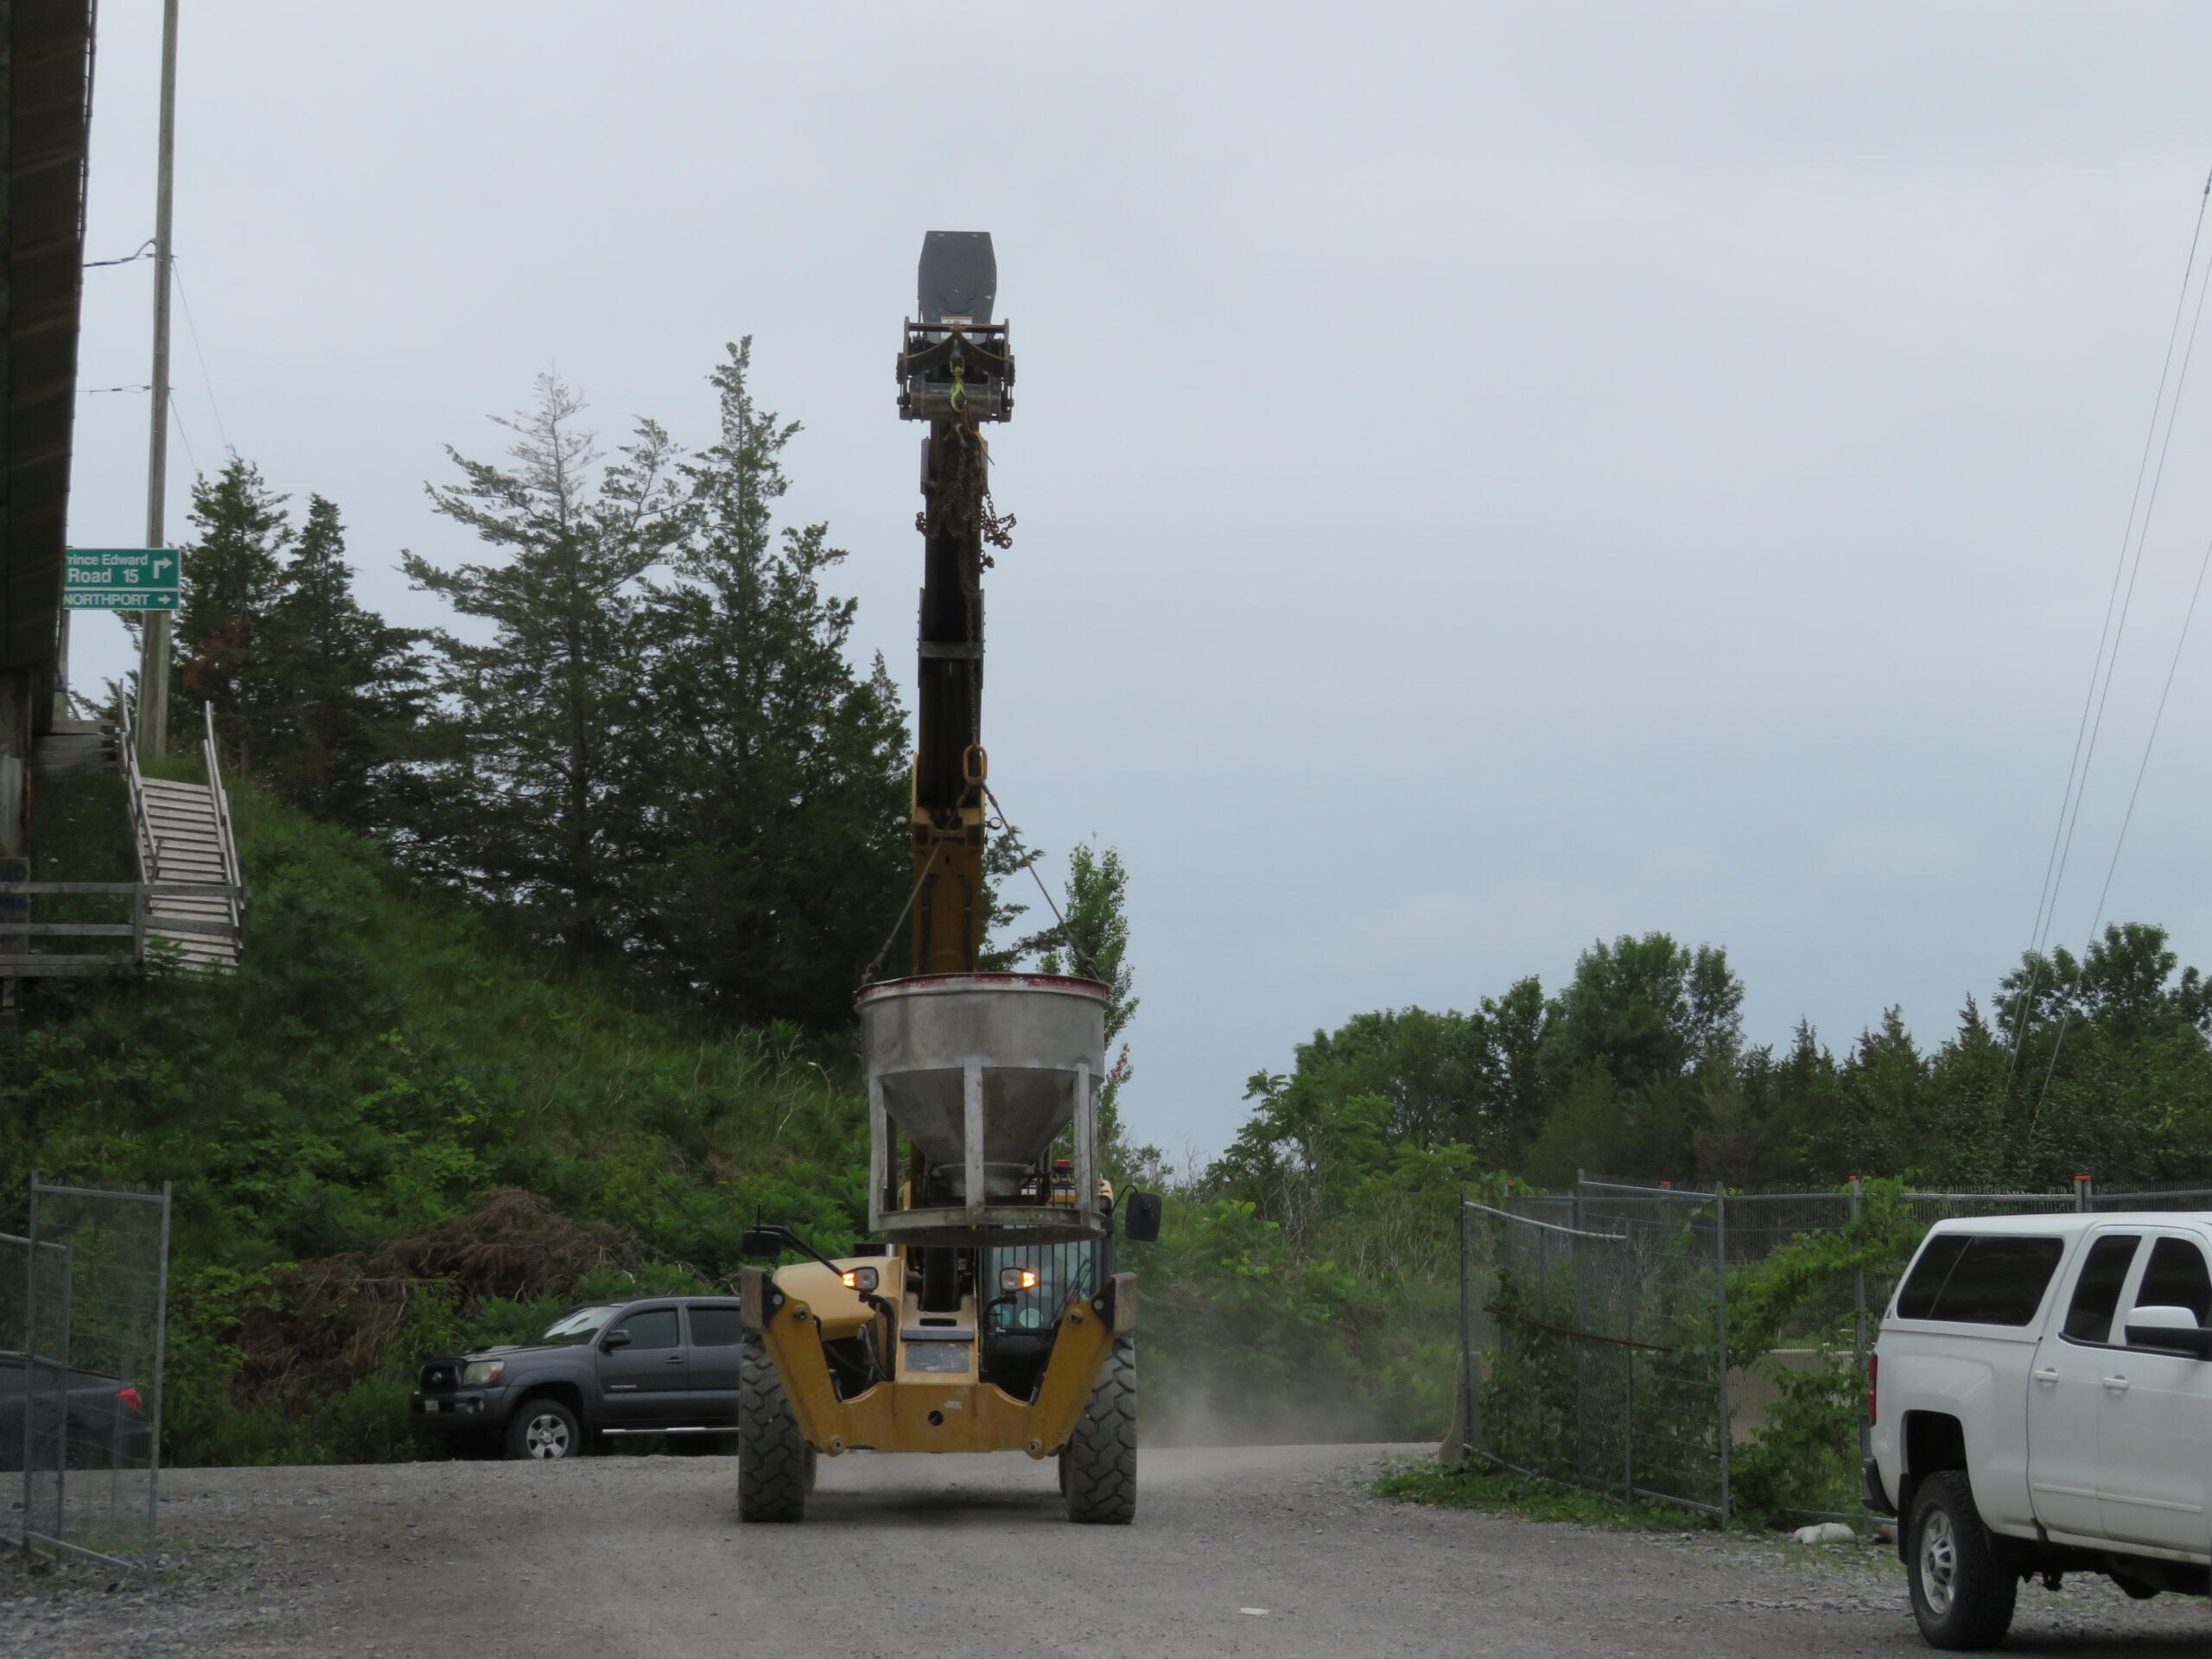 Telehandler delivering the hopper for concrete placement